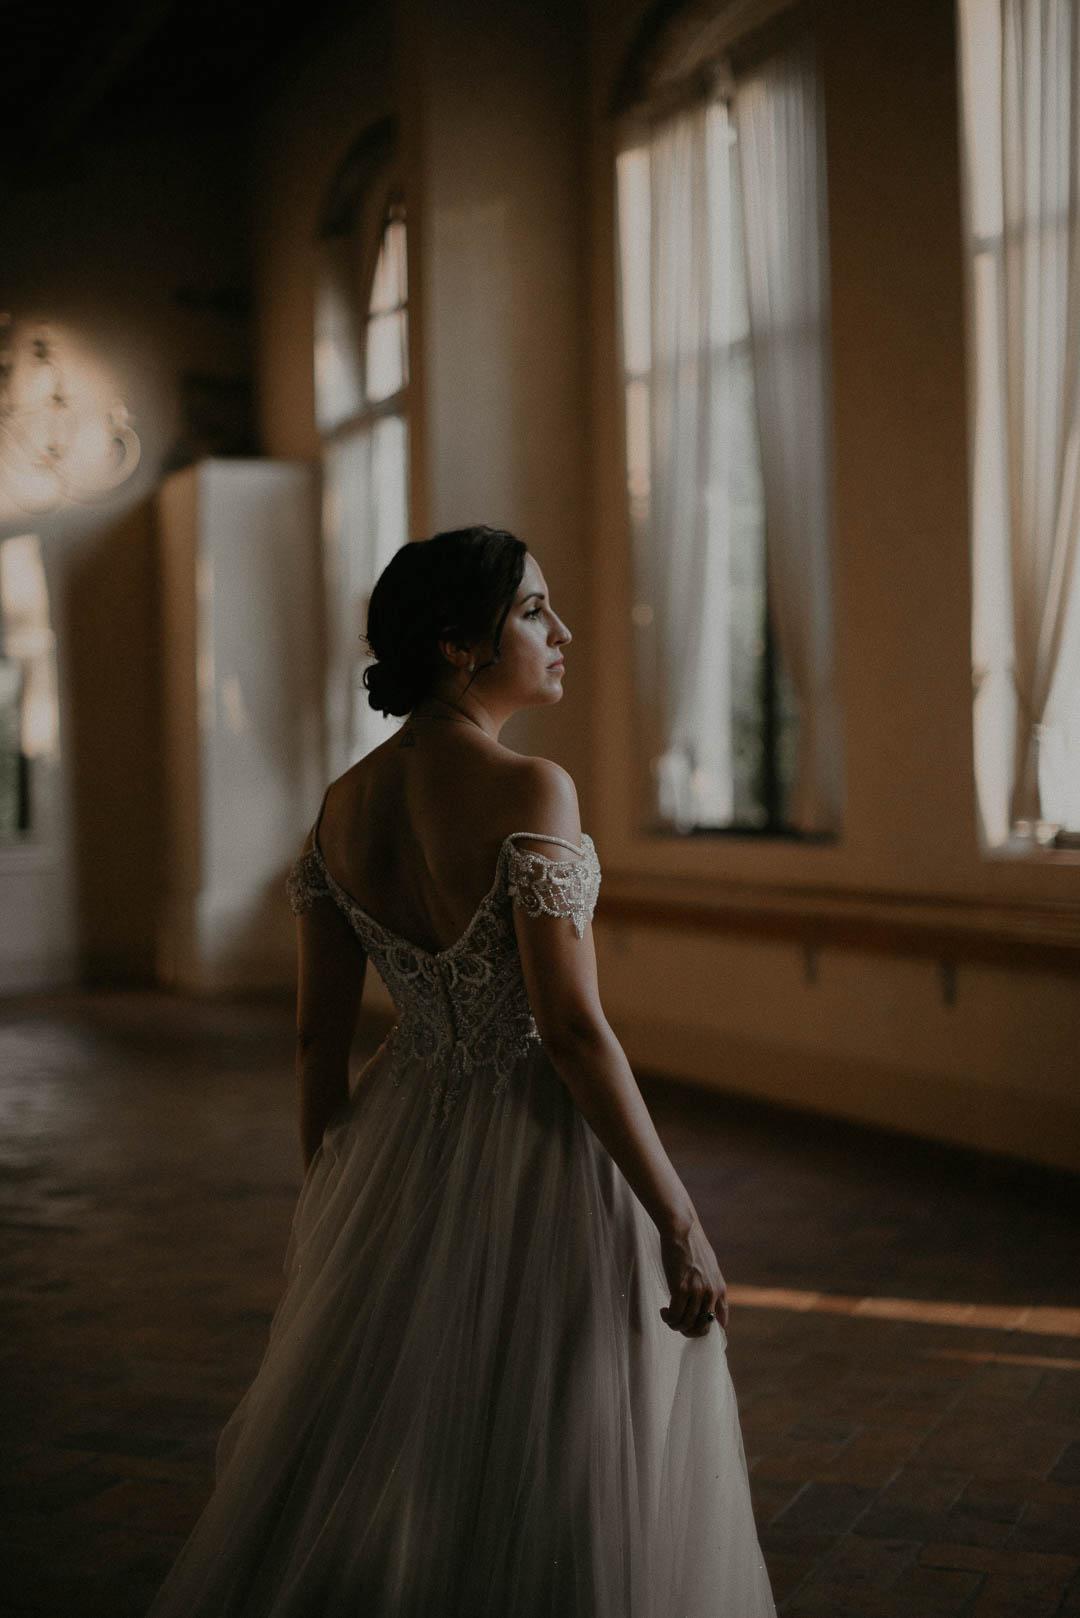 wedding-photographer-destination-fineart-bespoke-reportage-tuscany-villascorzi-vivianeizzo-spazio46-115